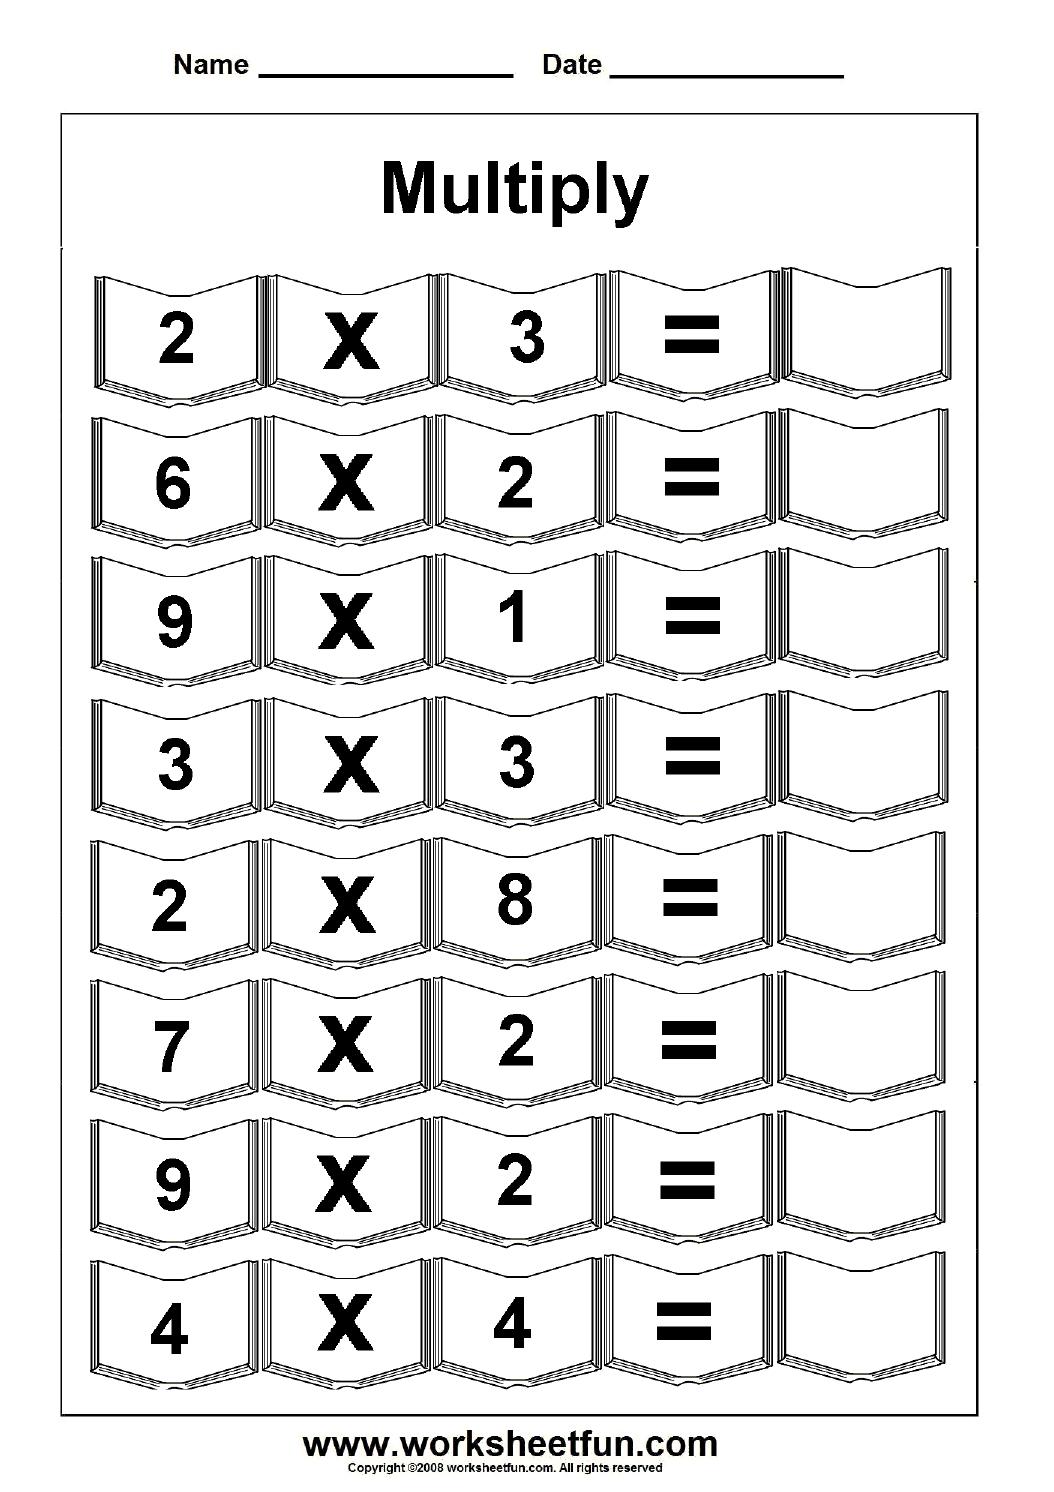 Multiplication – 5 Worksheets / Free Printable Worksheets – Worksheetfun - Free Printable Multiplication Worksheets